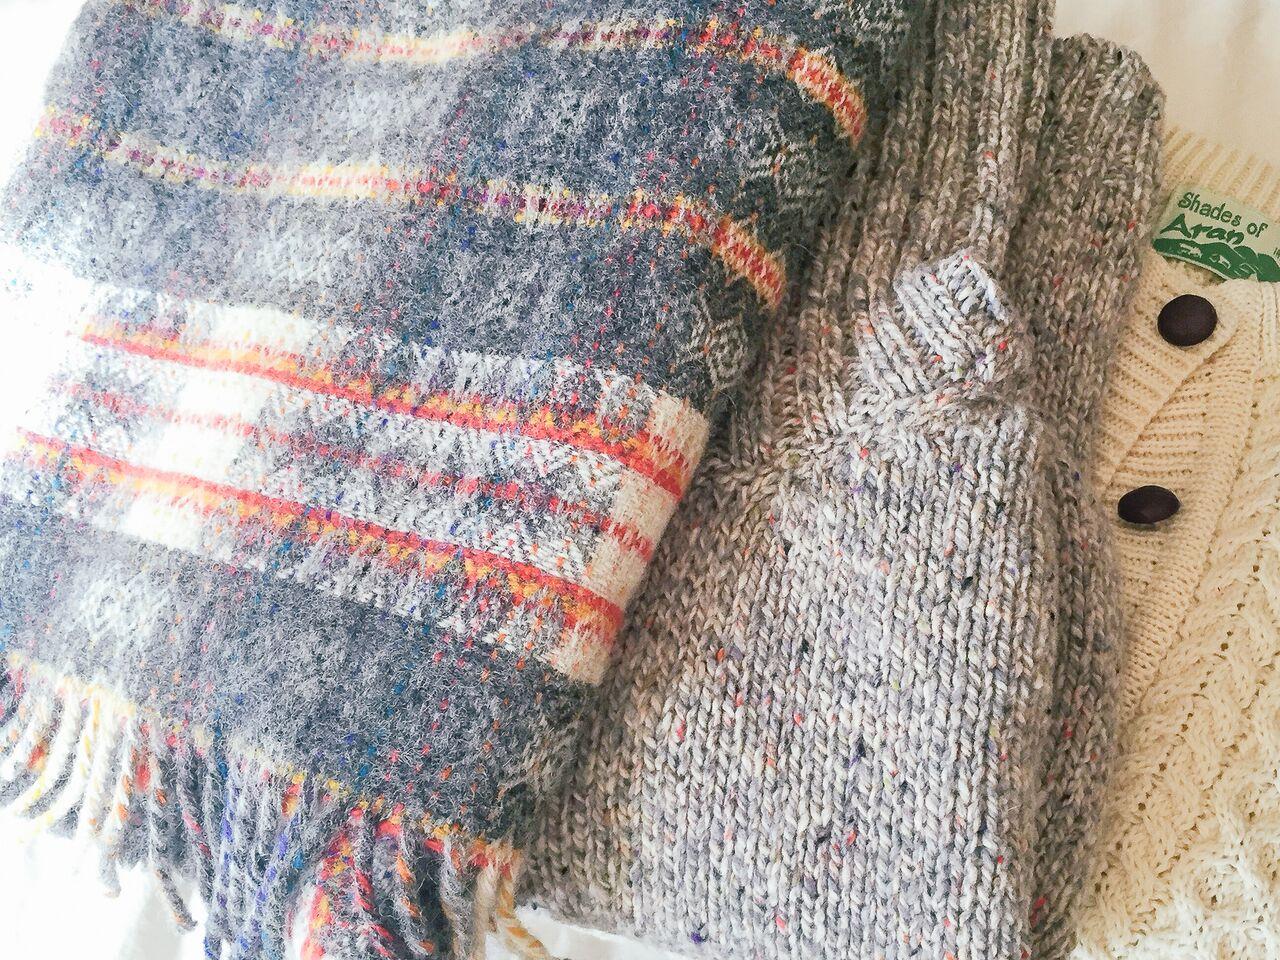 Tweed Project plaid and Aran Islands knits